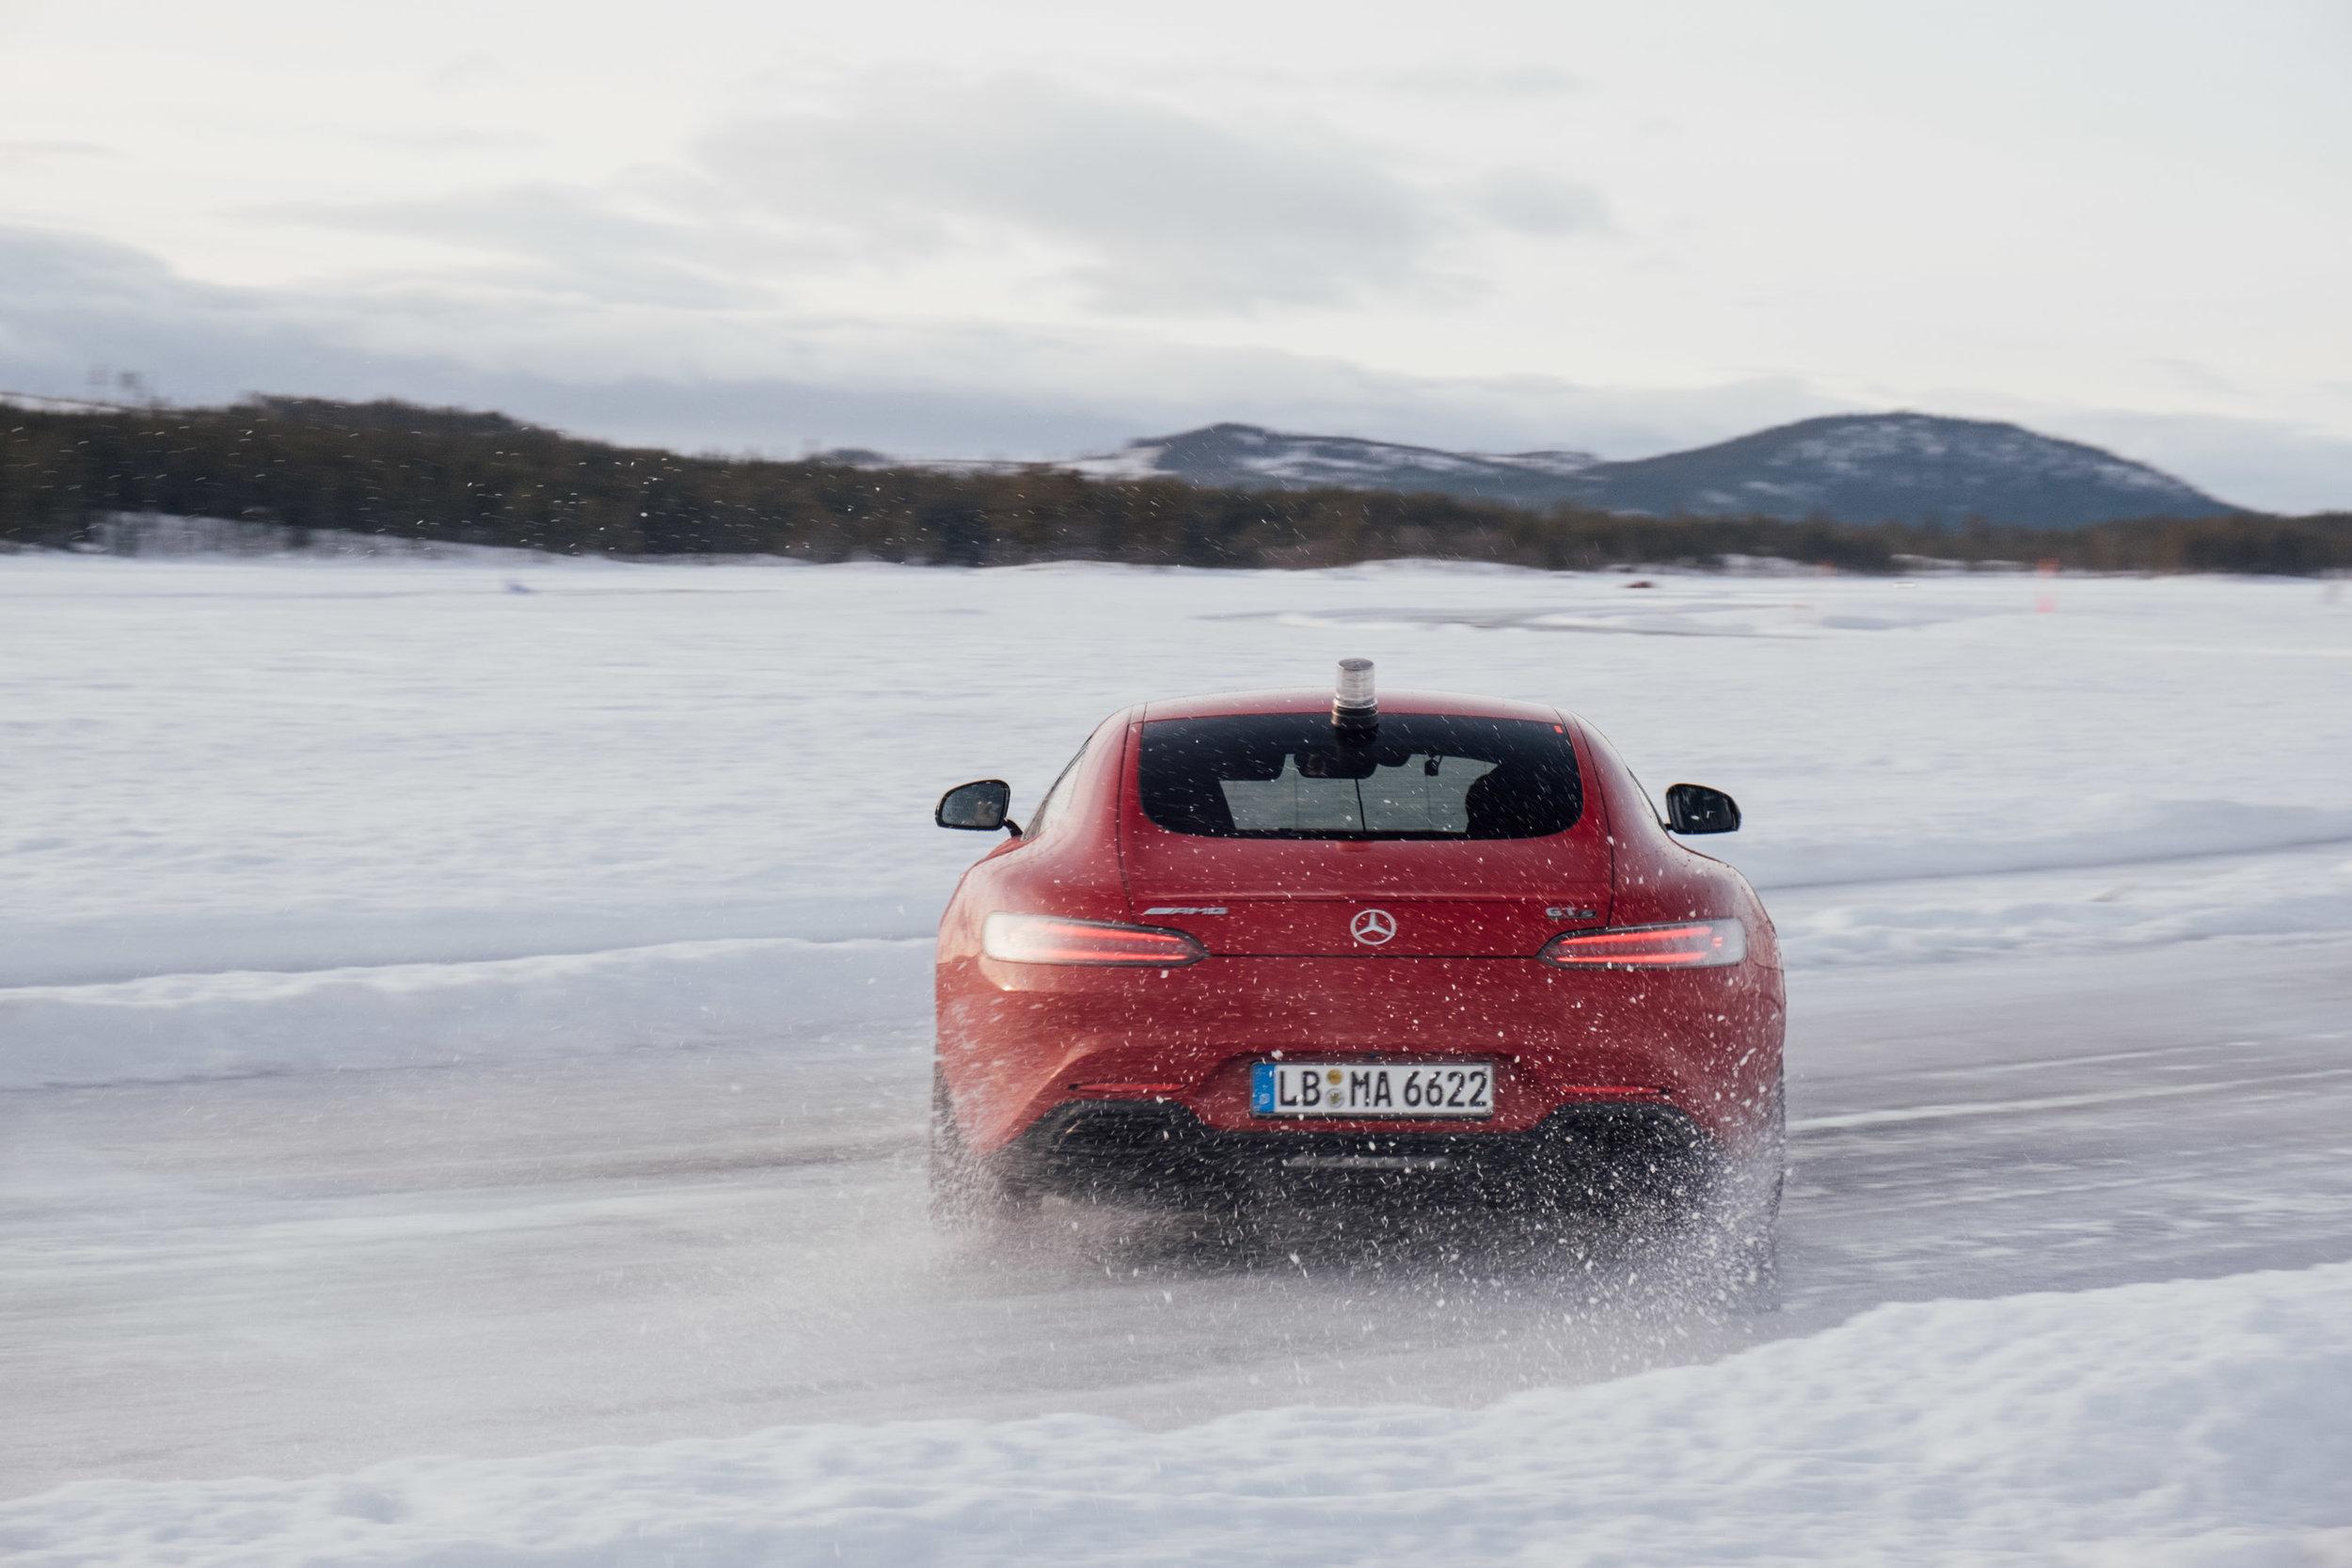 Drive_for_Good_Ice_Drive_by_Maxim_Kuijper-0138.jpg